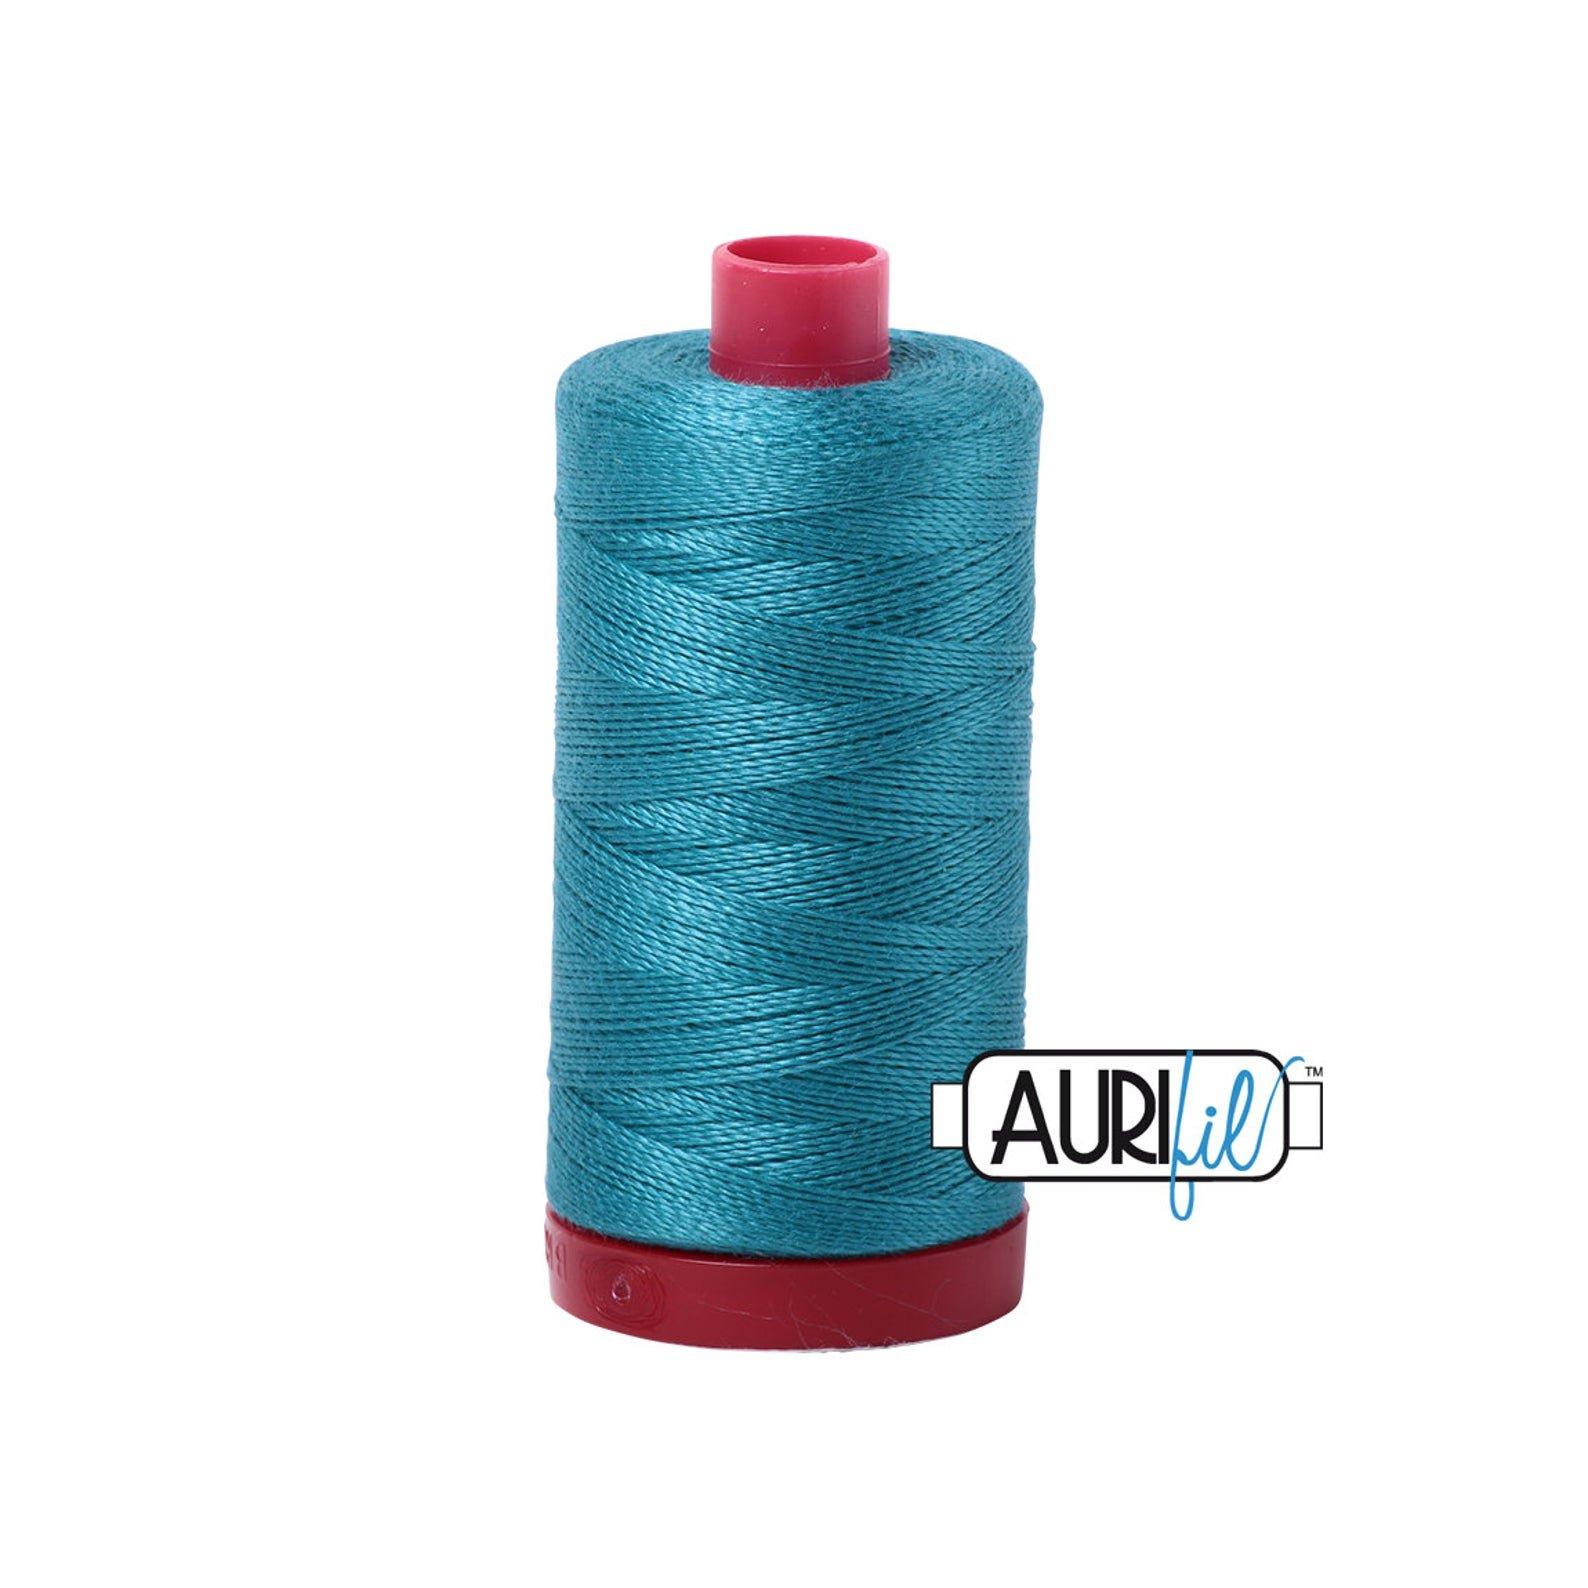 Mako Cotton Embroidery Thread 12wt 356yds Dark Turquoise